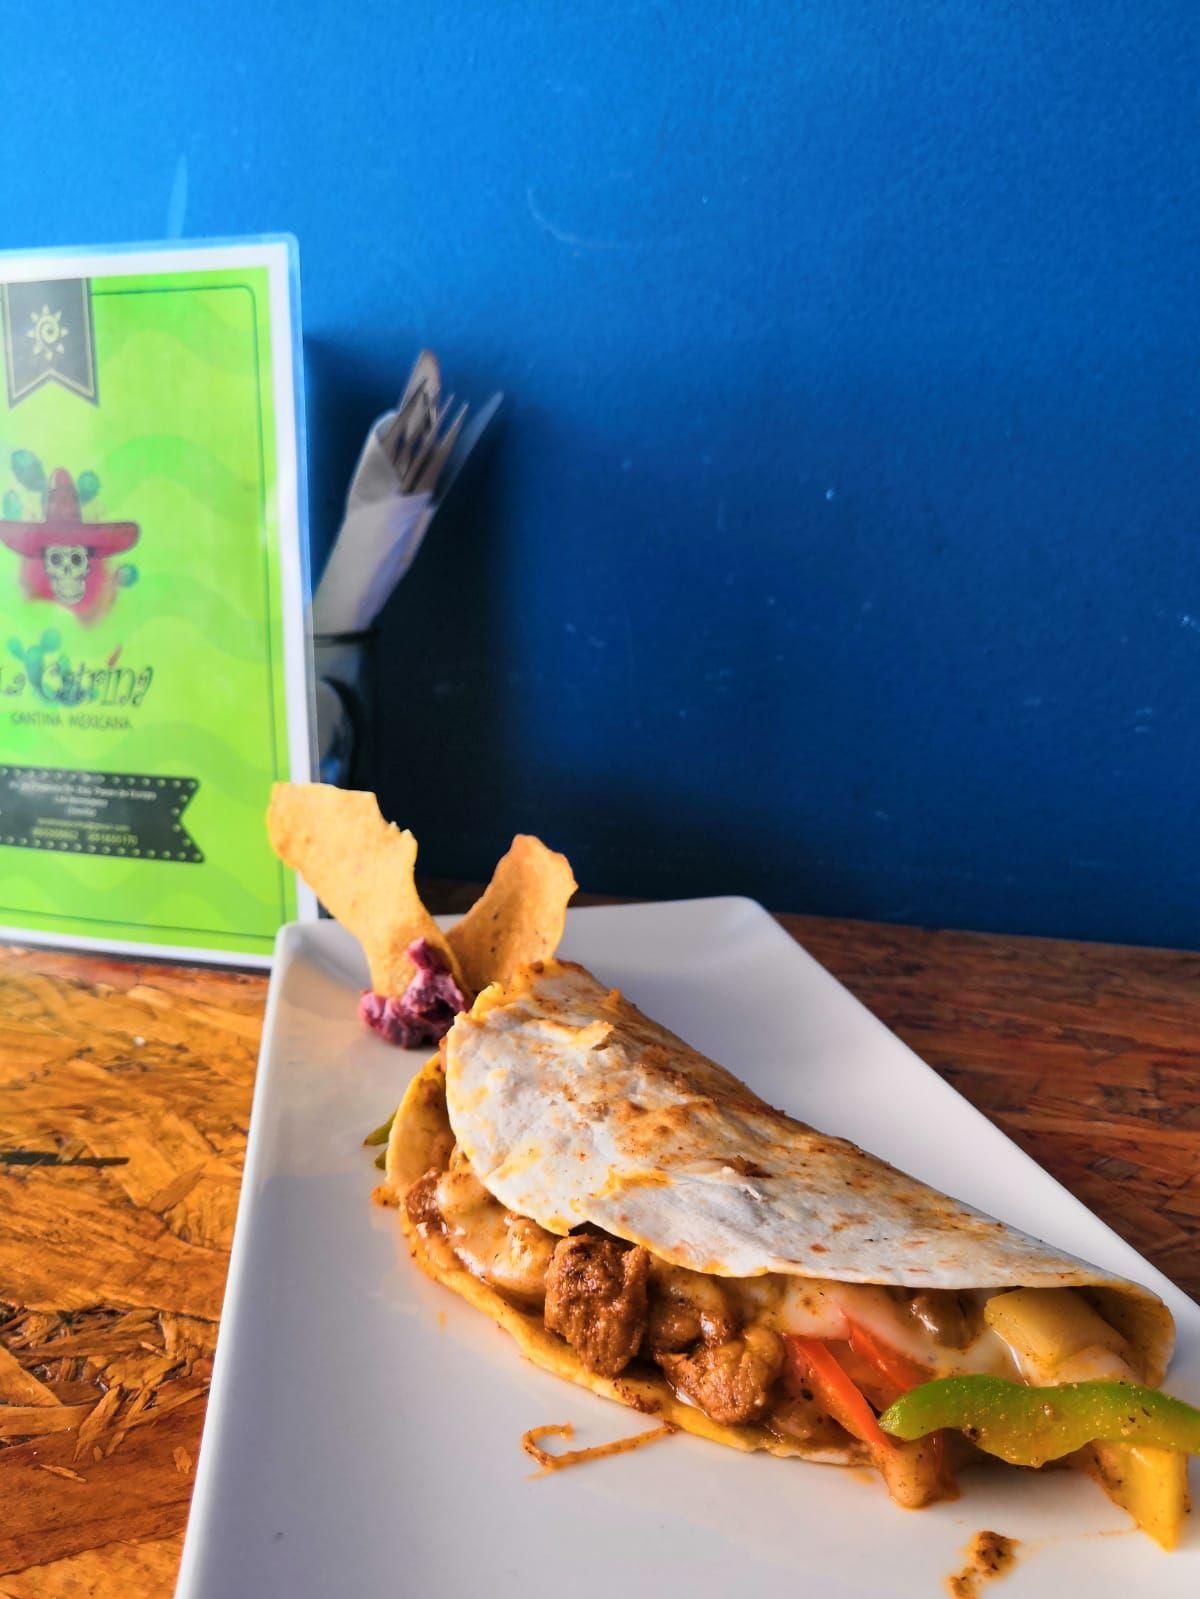 Foto 48 de Restaurante mexicano en  | Cantina La Catrina